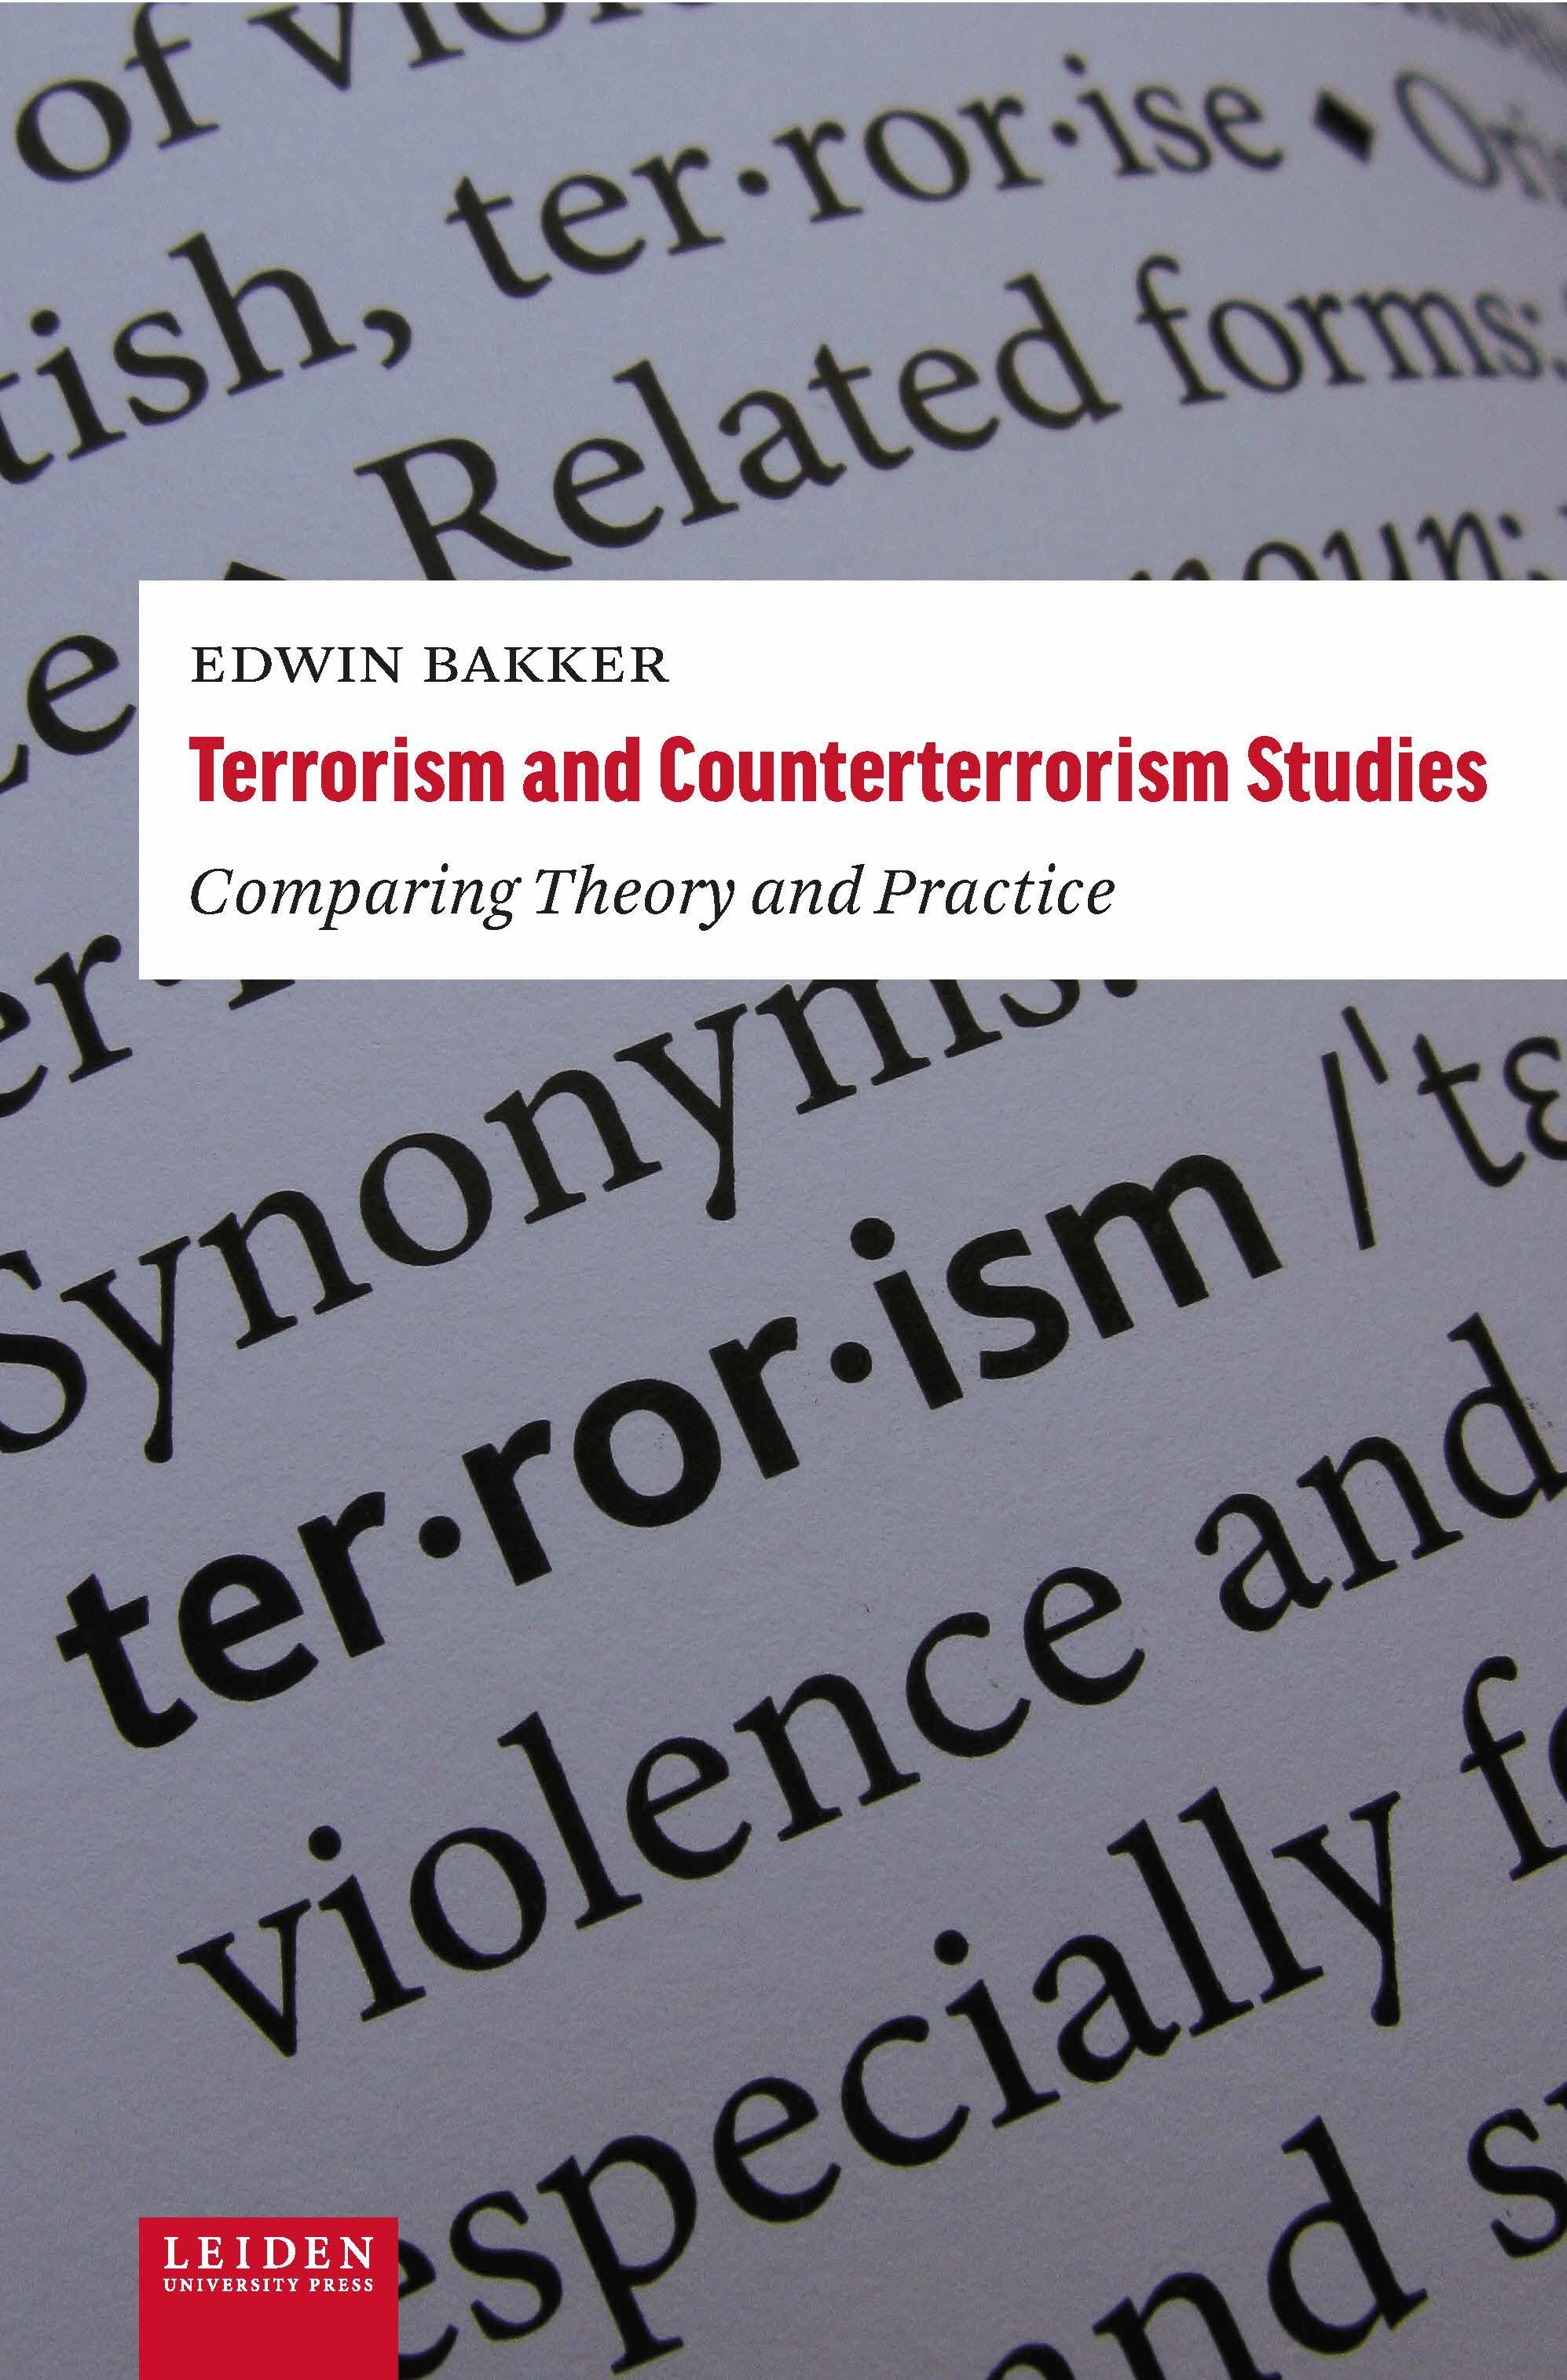 Terrorism and Counterterrorism Studies